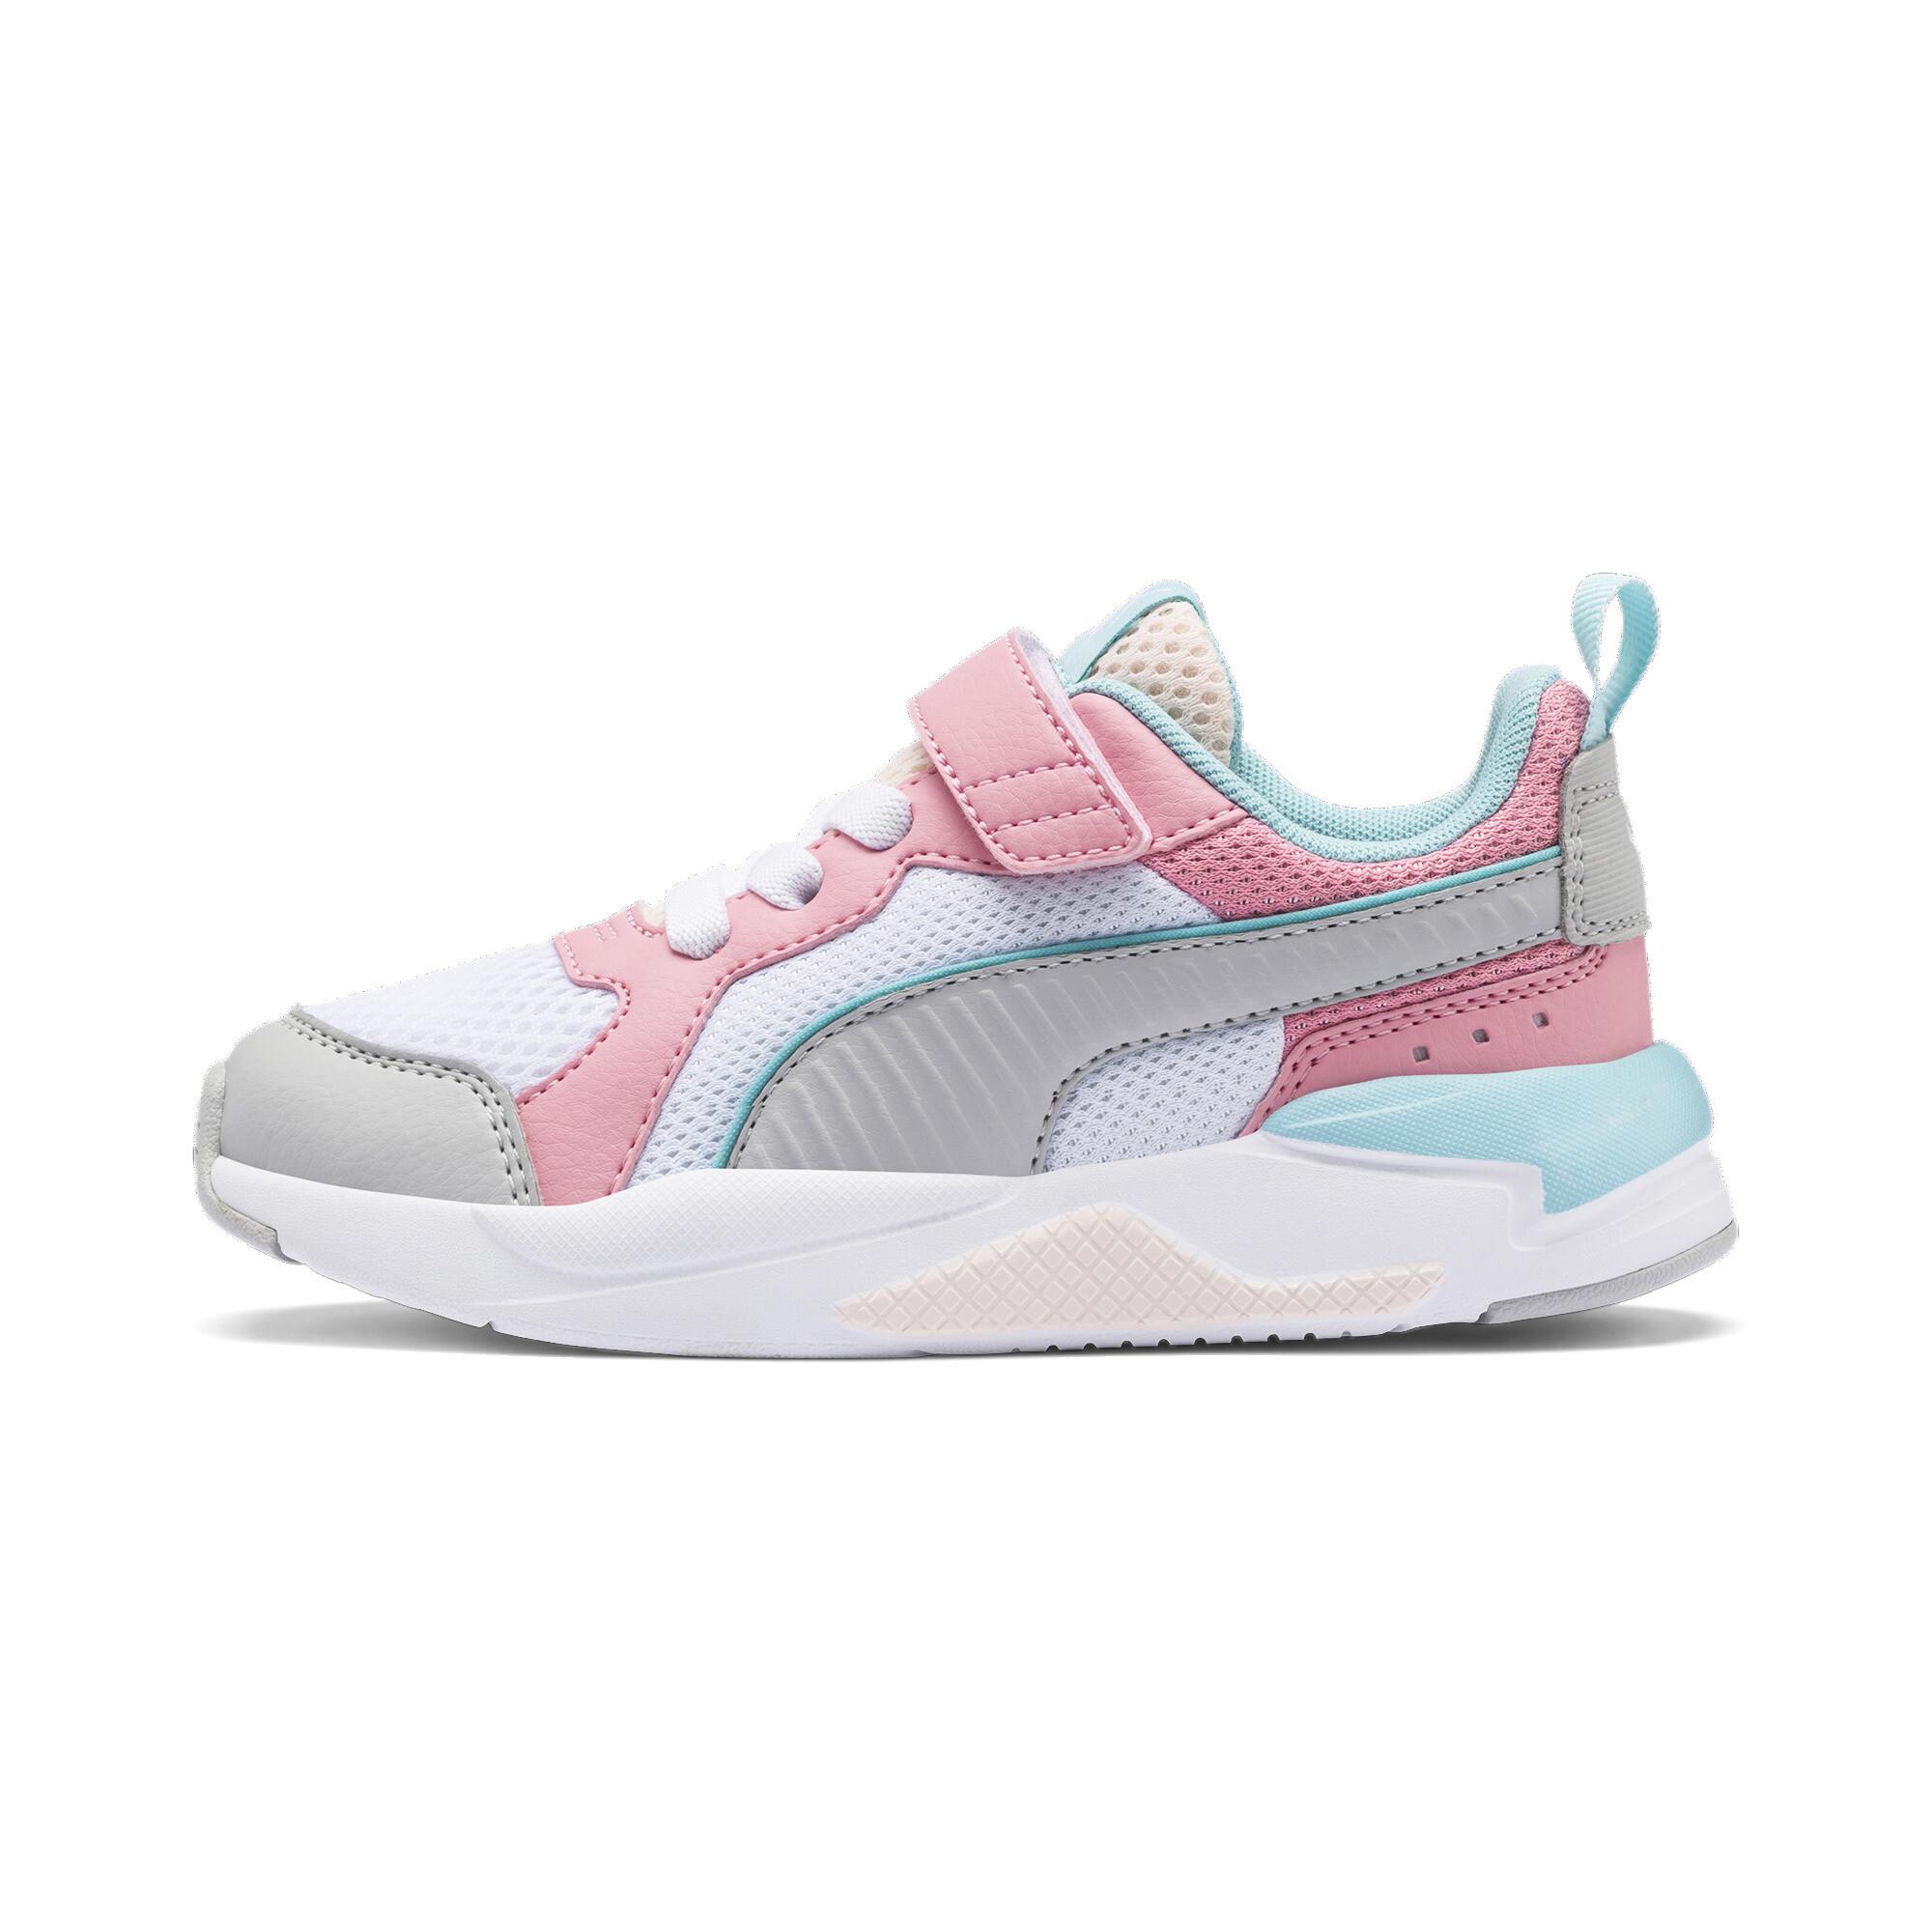 PUMA-X-RAY-Little-Kids-039-Shoes-Kids-Shoe-Kids thumbnail 4